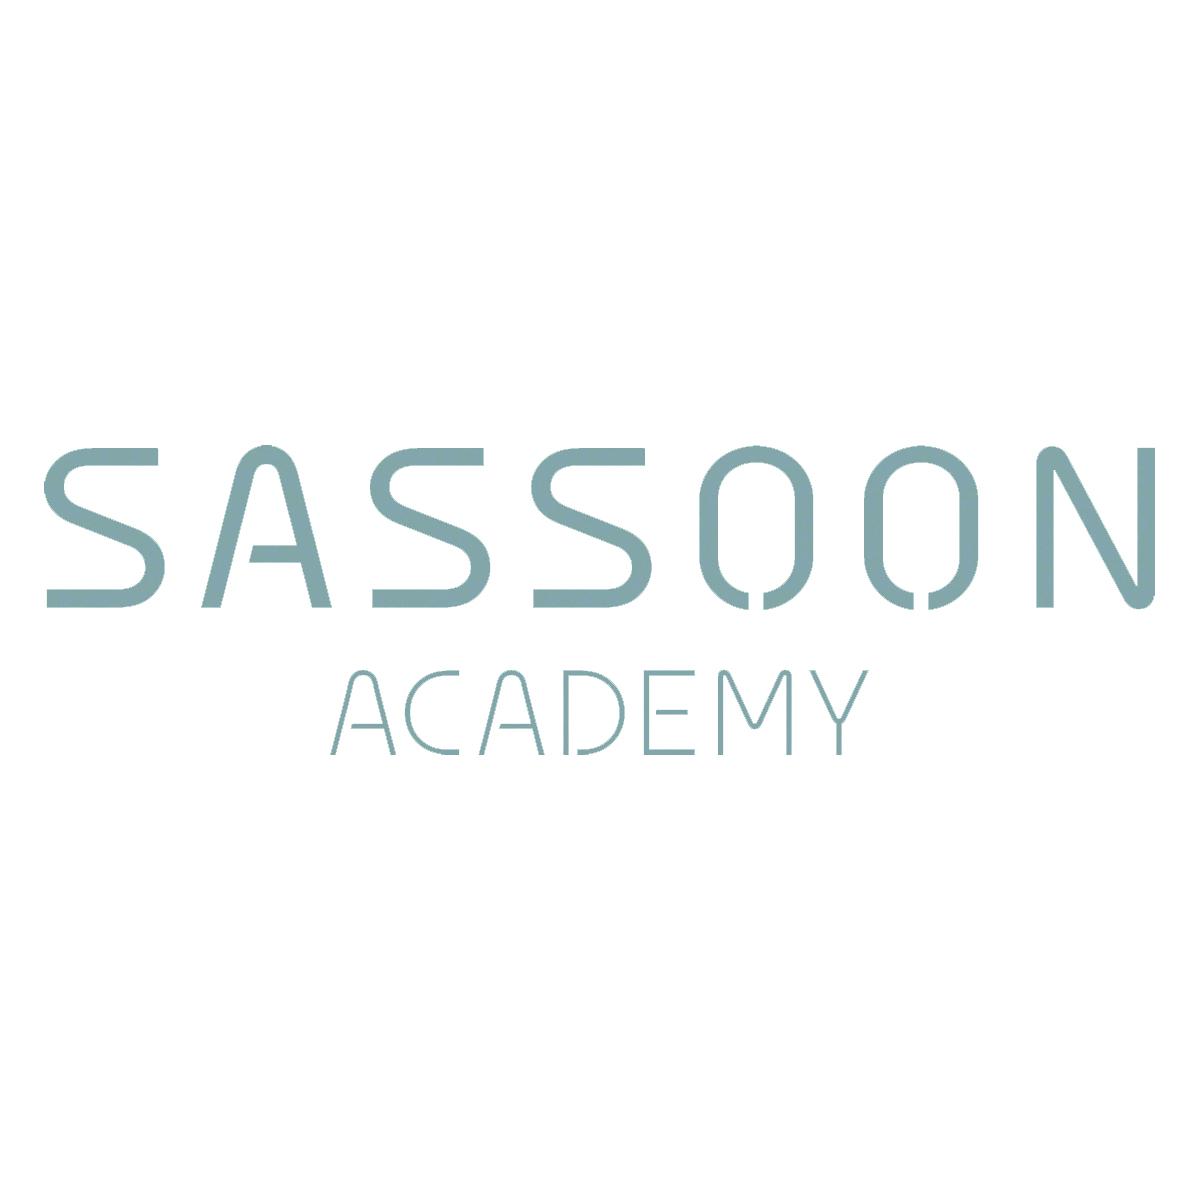 Sassoon-Academy-logo-quad